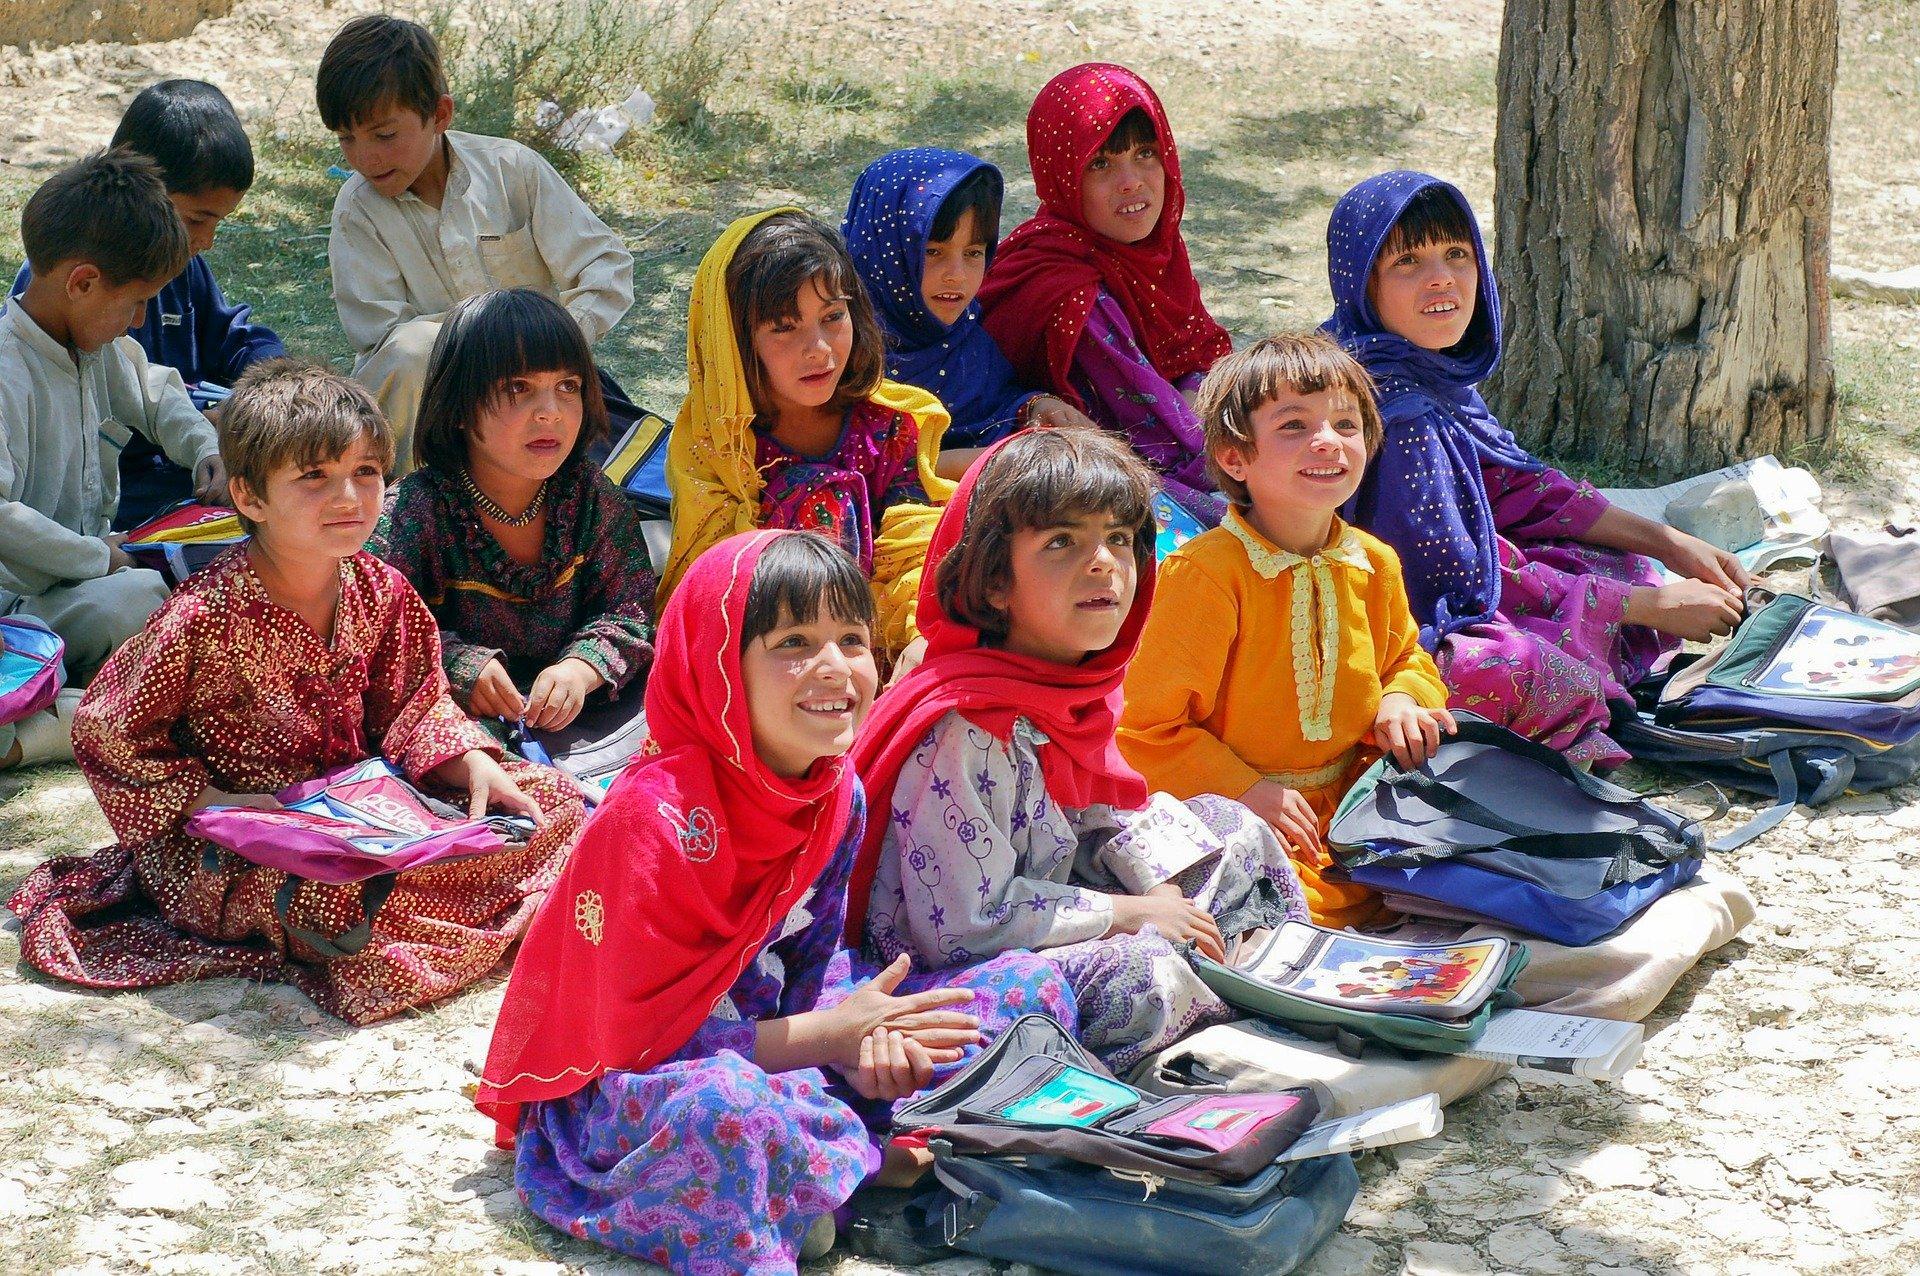 File photo / Children / Afghanistan